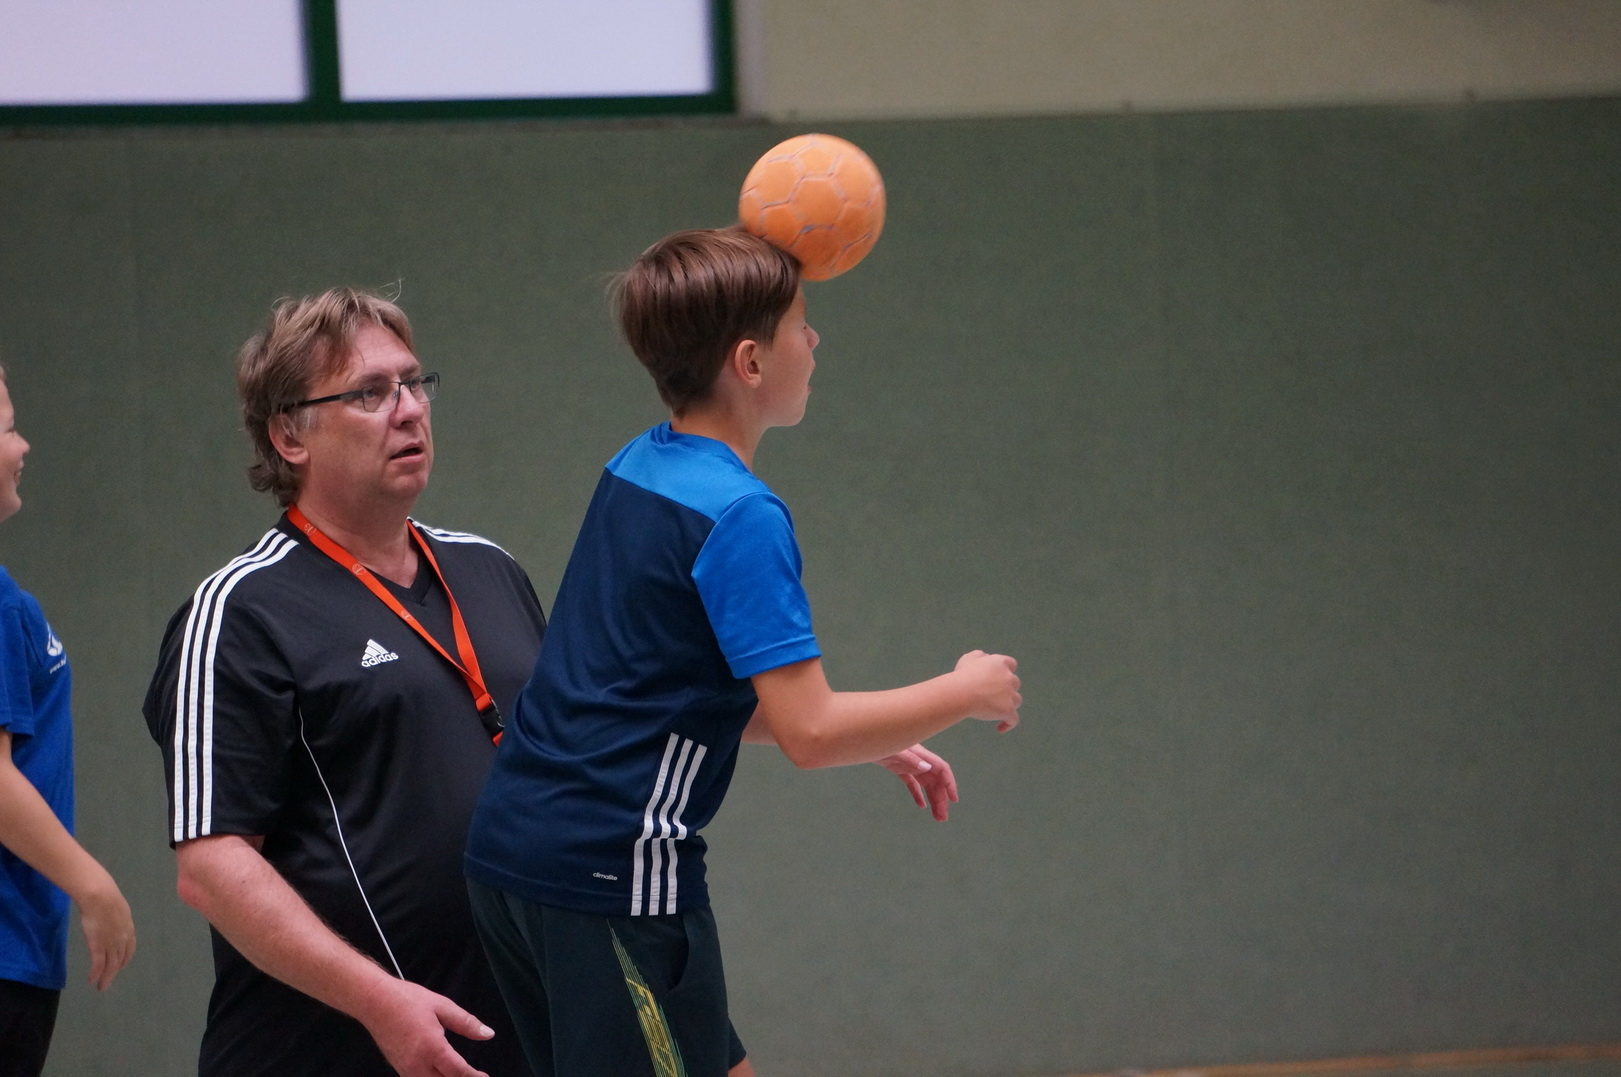 201808_Handballcamp_SDH_MG_184w